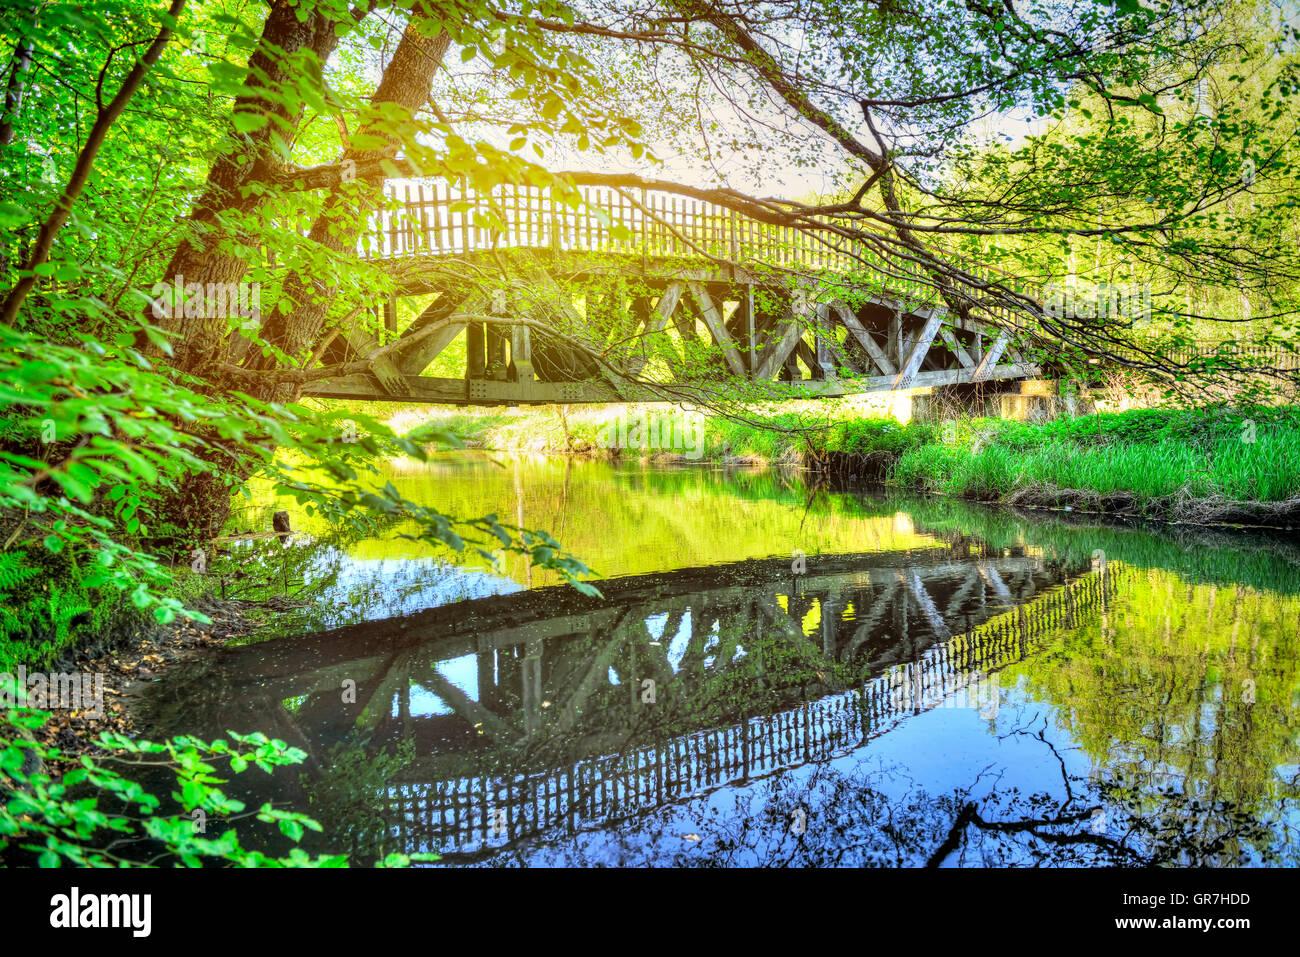 River Bille In Bergedorf, Hamburg, Germany - Stock Image